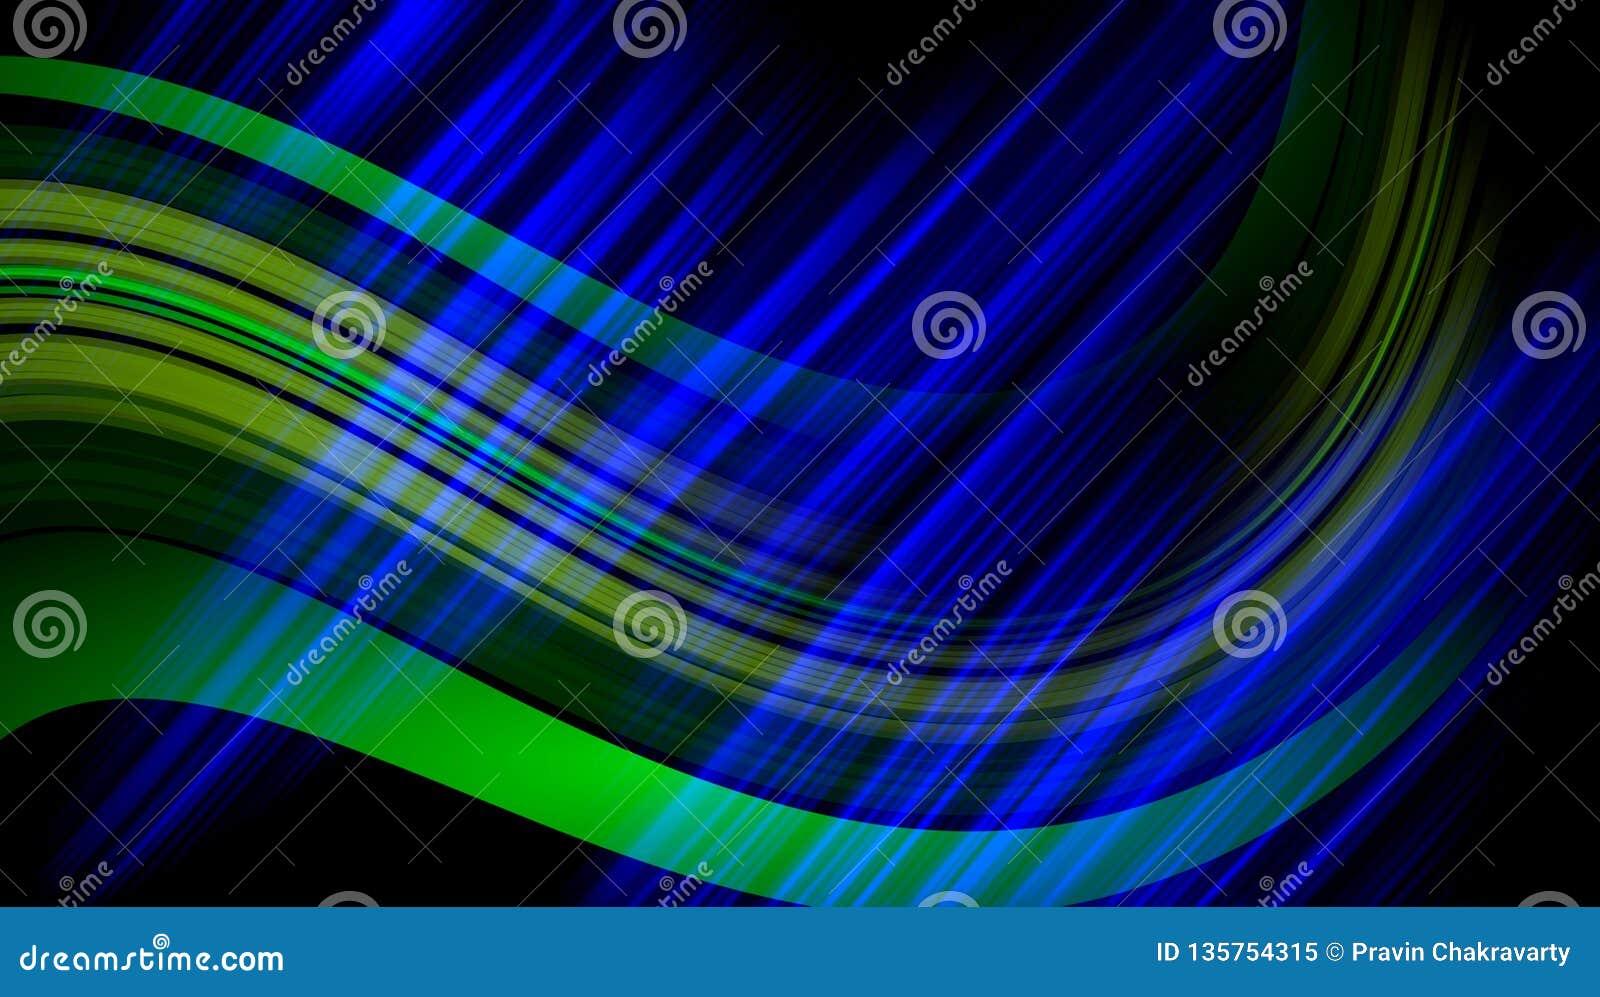 Blur Colorful Background Wallpaper Stock Illustration